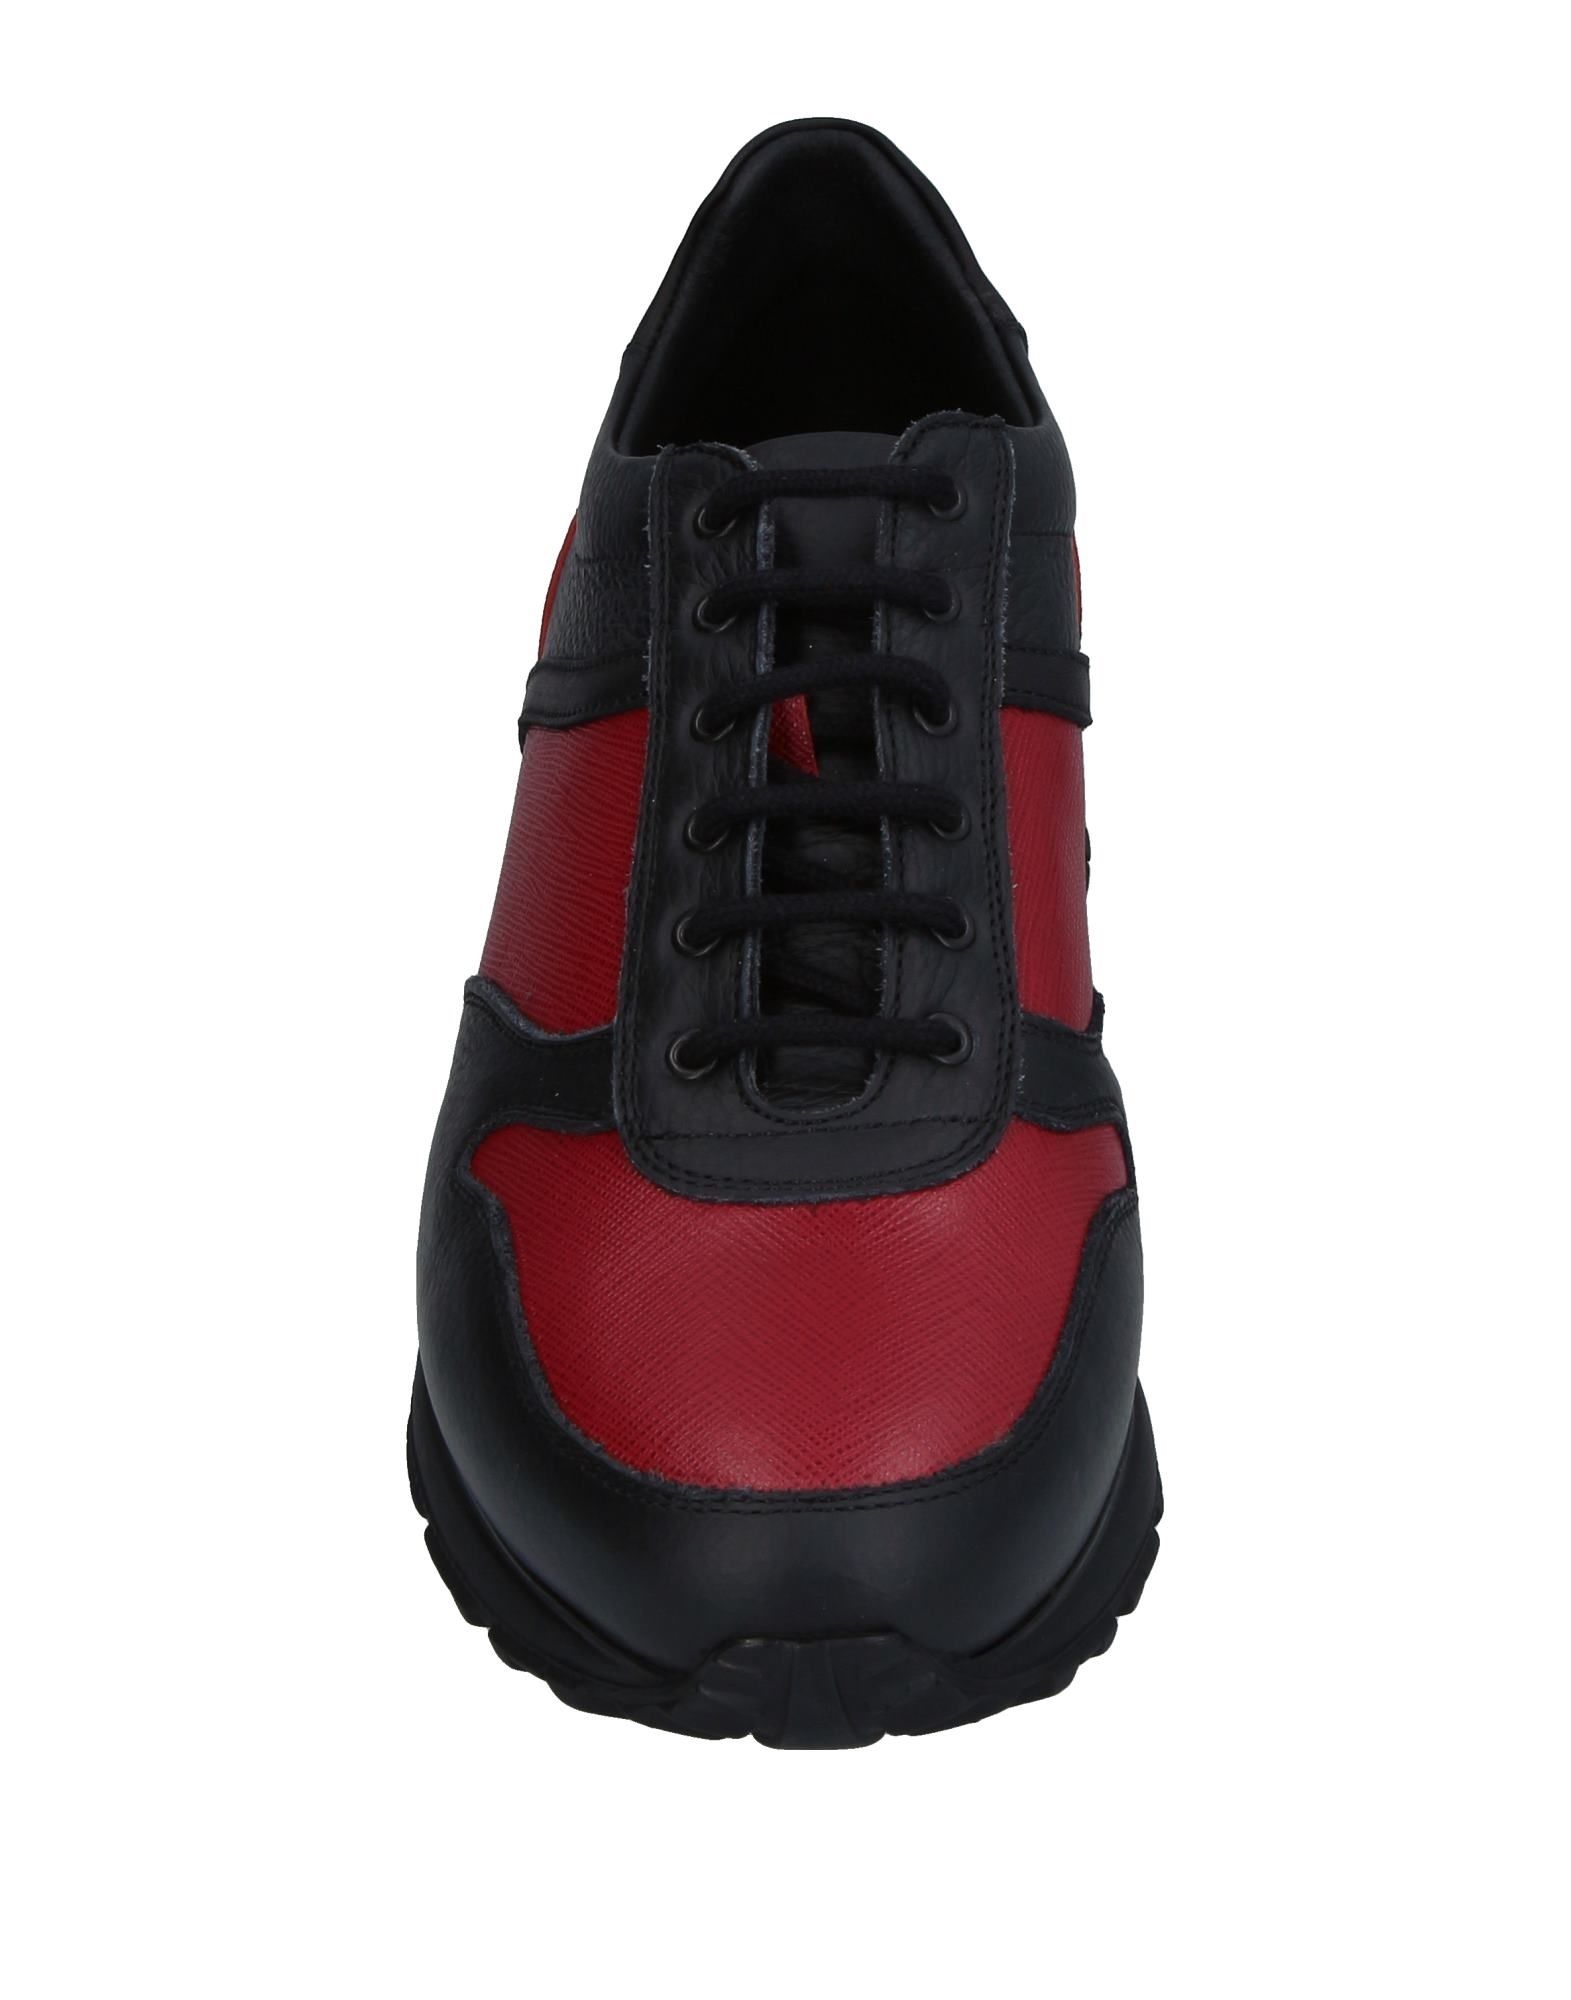 Giovanni Conti Sneakers Herren beliebte  11292955TG Gute Qualität beliebte Herren Schuhe 54c8b7